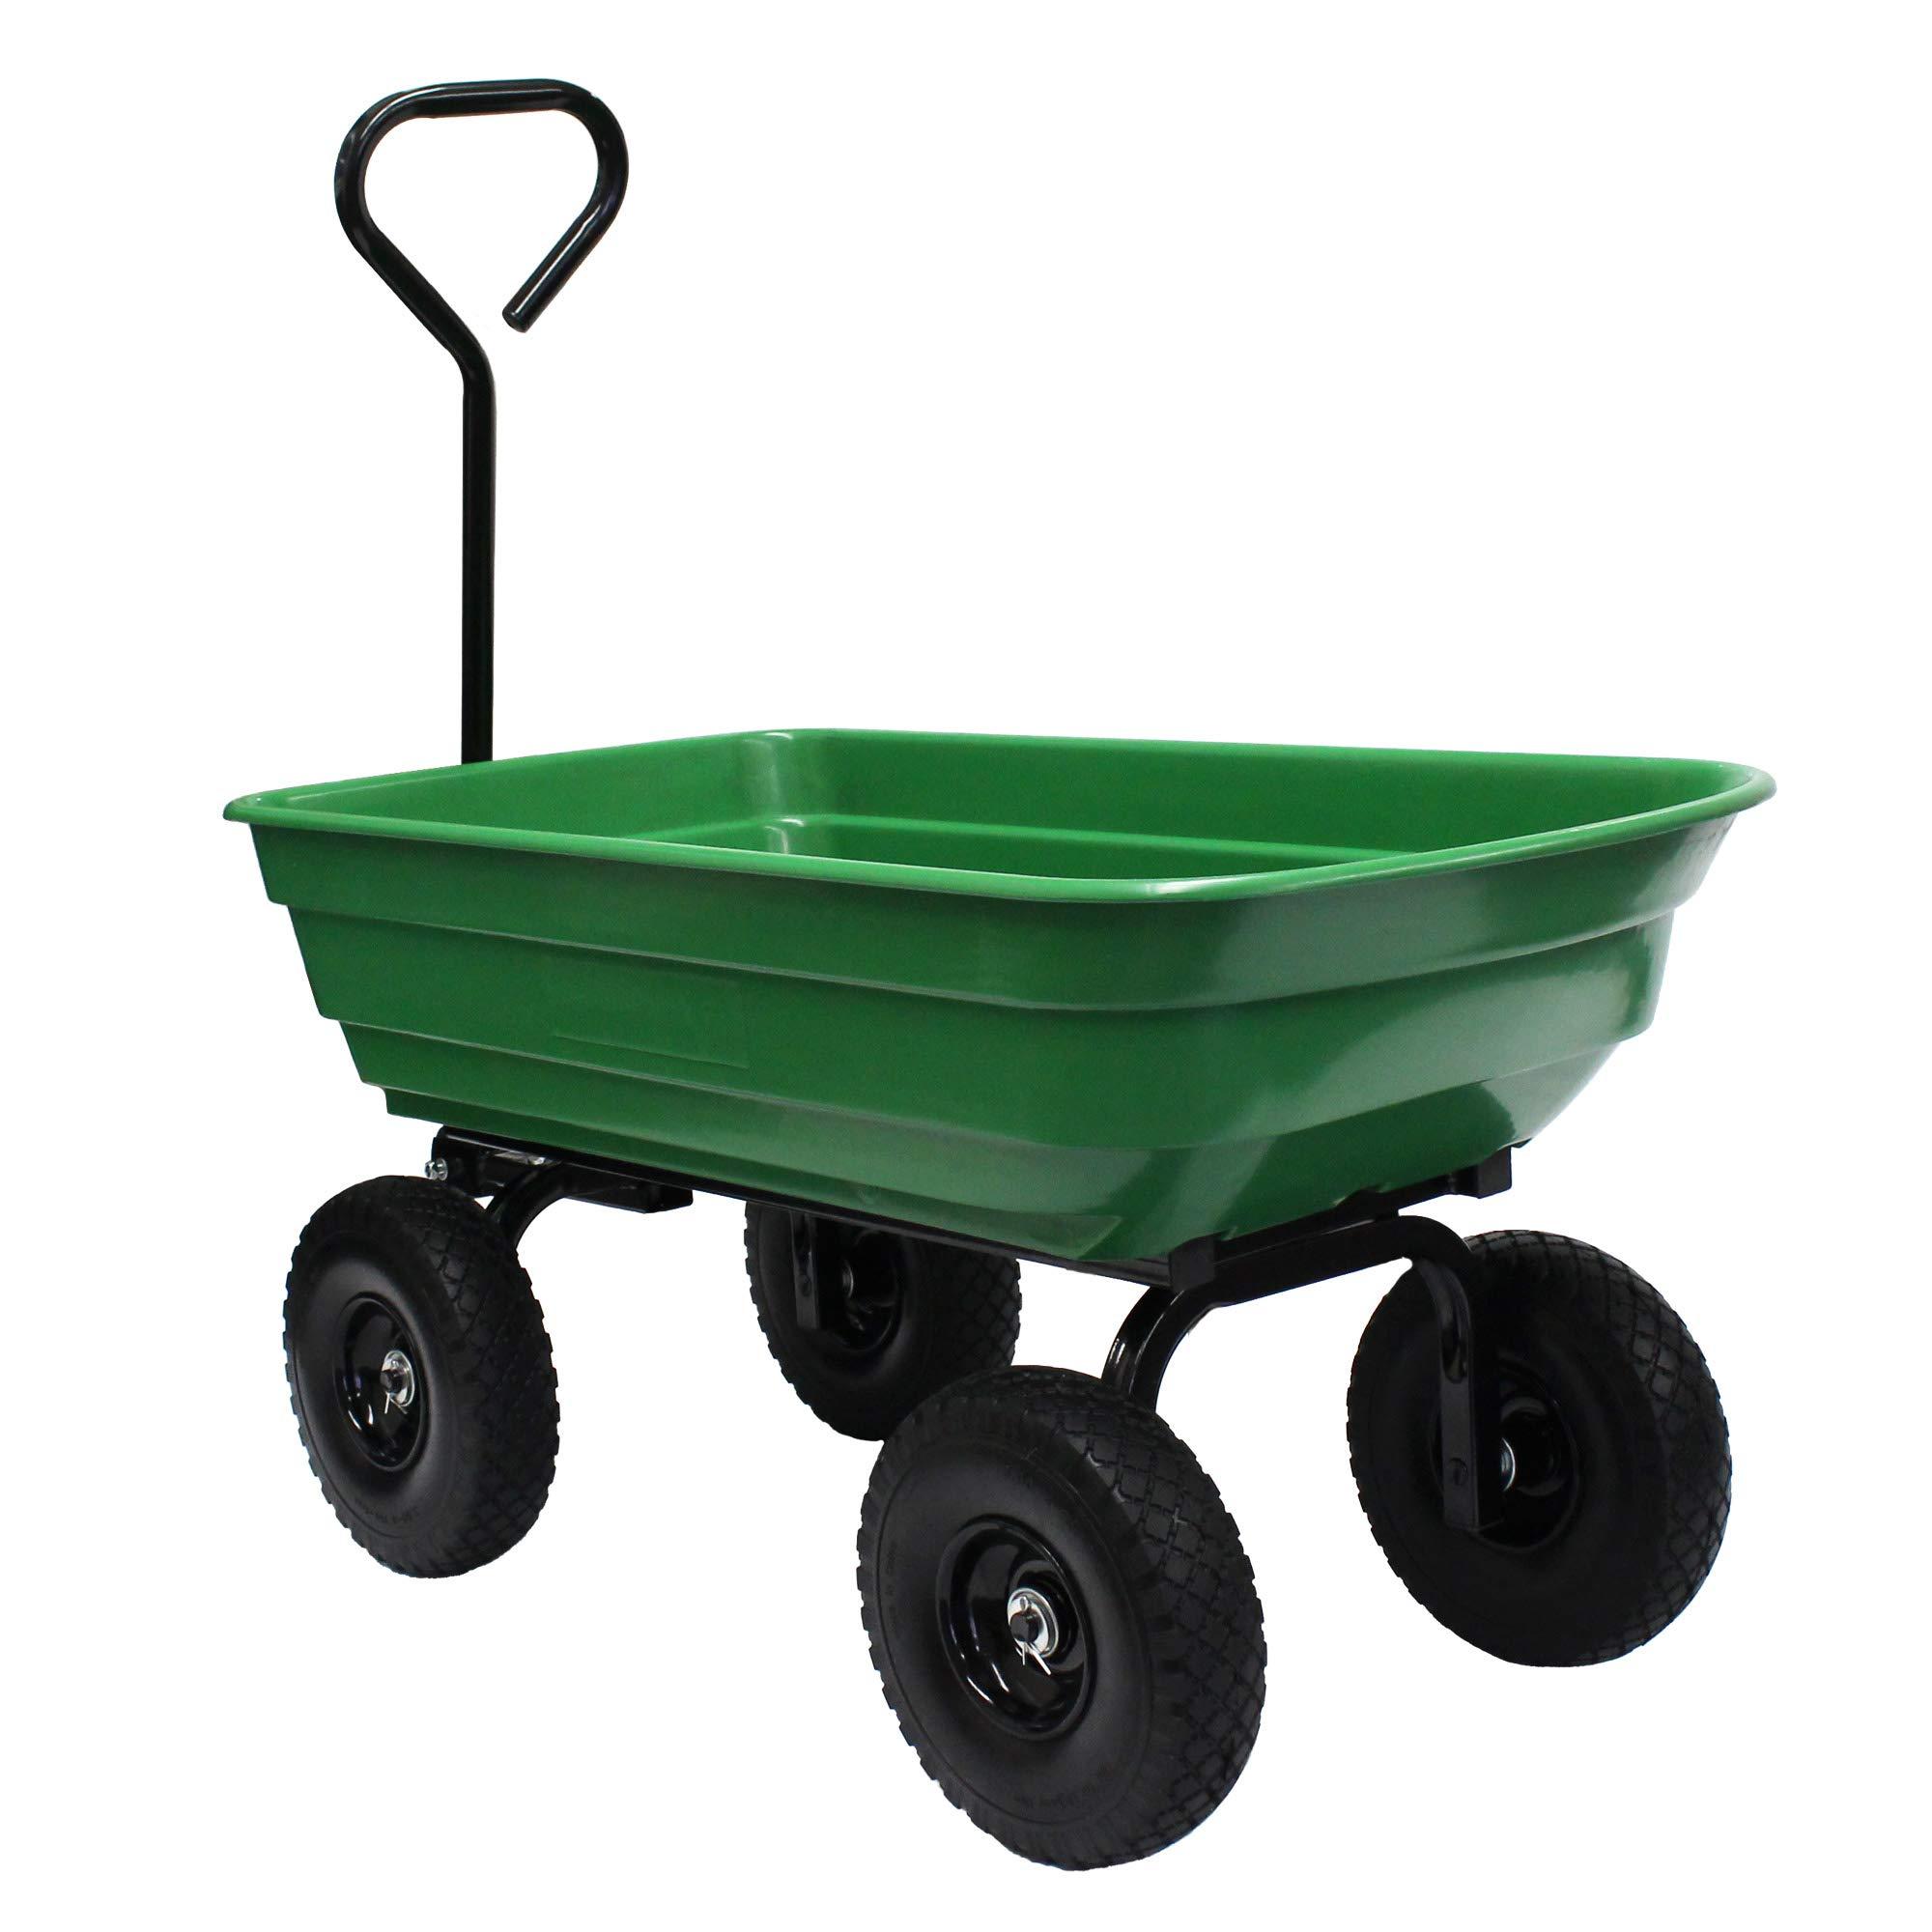 Garden Star 70275 Garden Wagon/Yard Cart with Flat Free Tires, 37'' x 20'' Poly Tray, 600lb Capacity